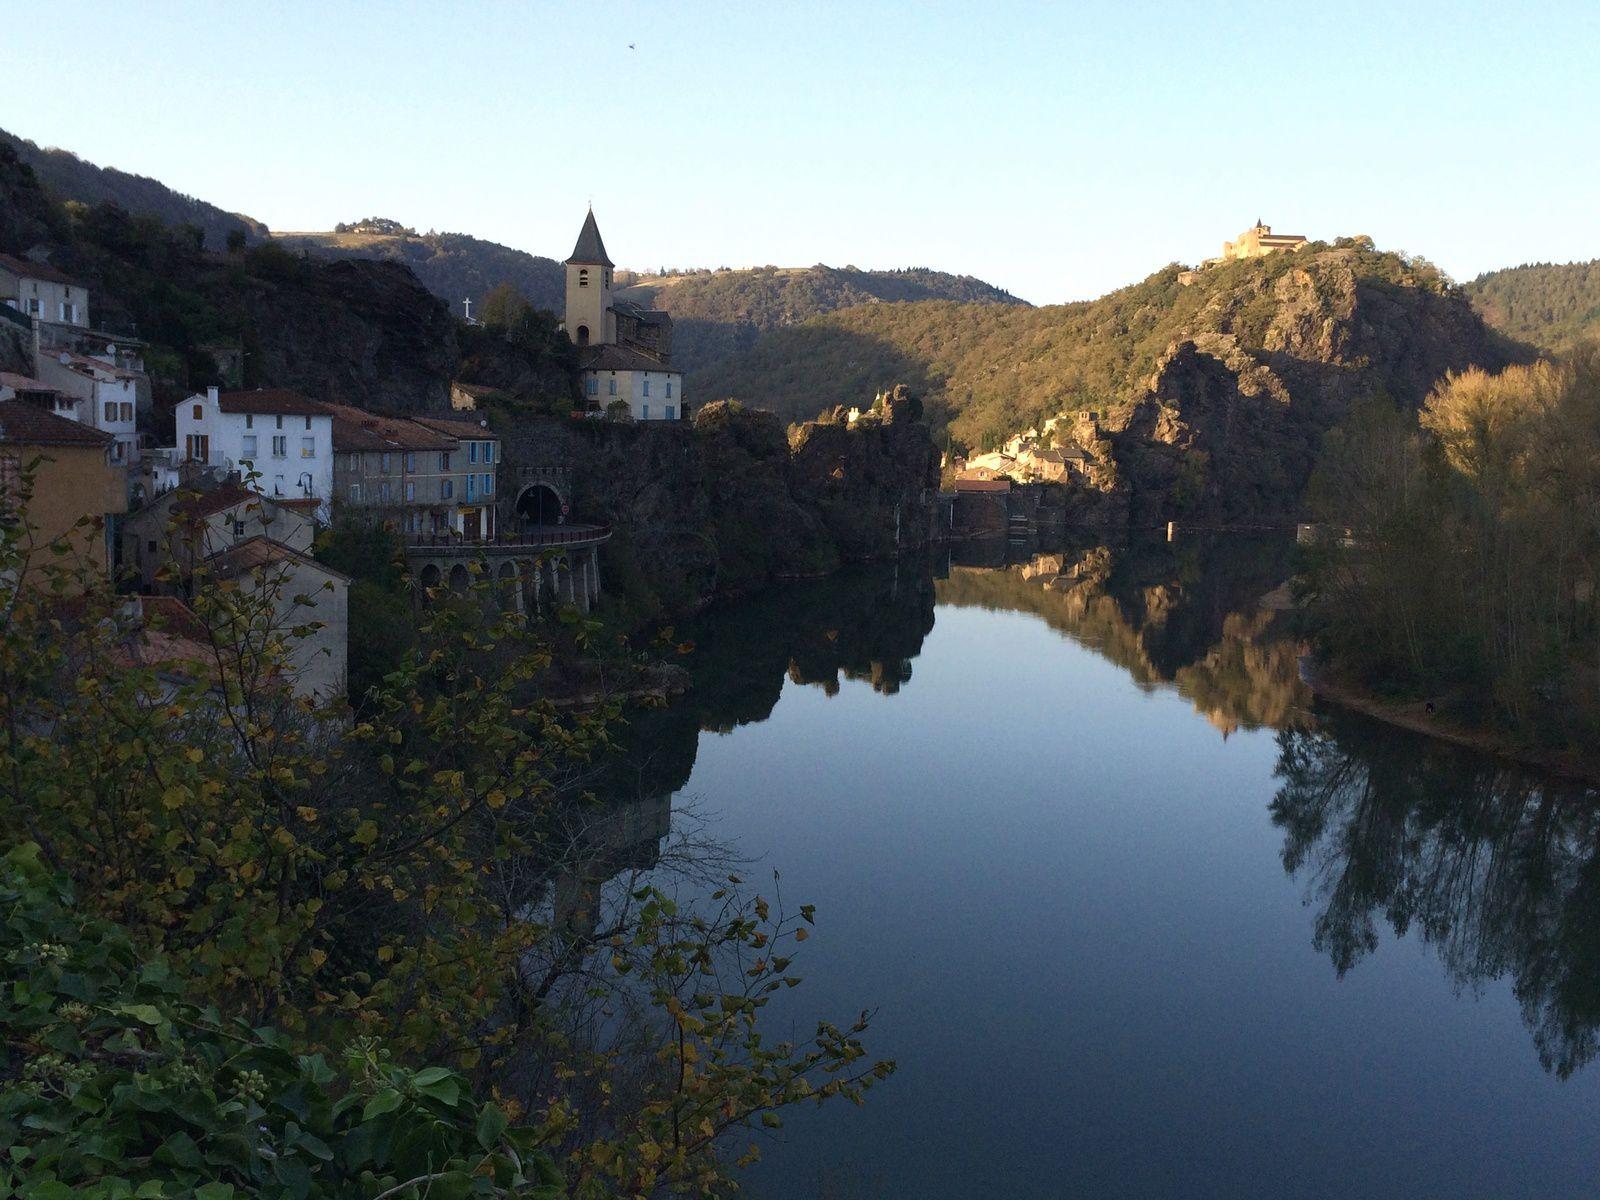 Ambialet, Tarn, le 01/11/2014